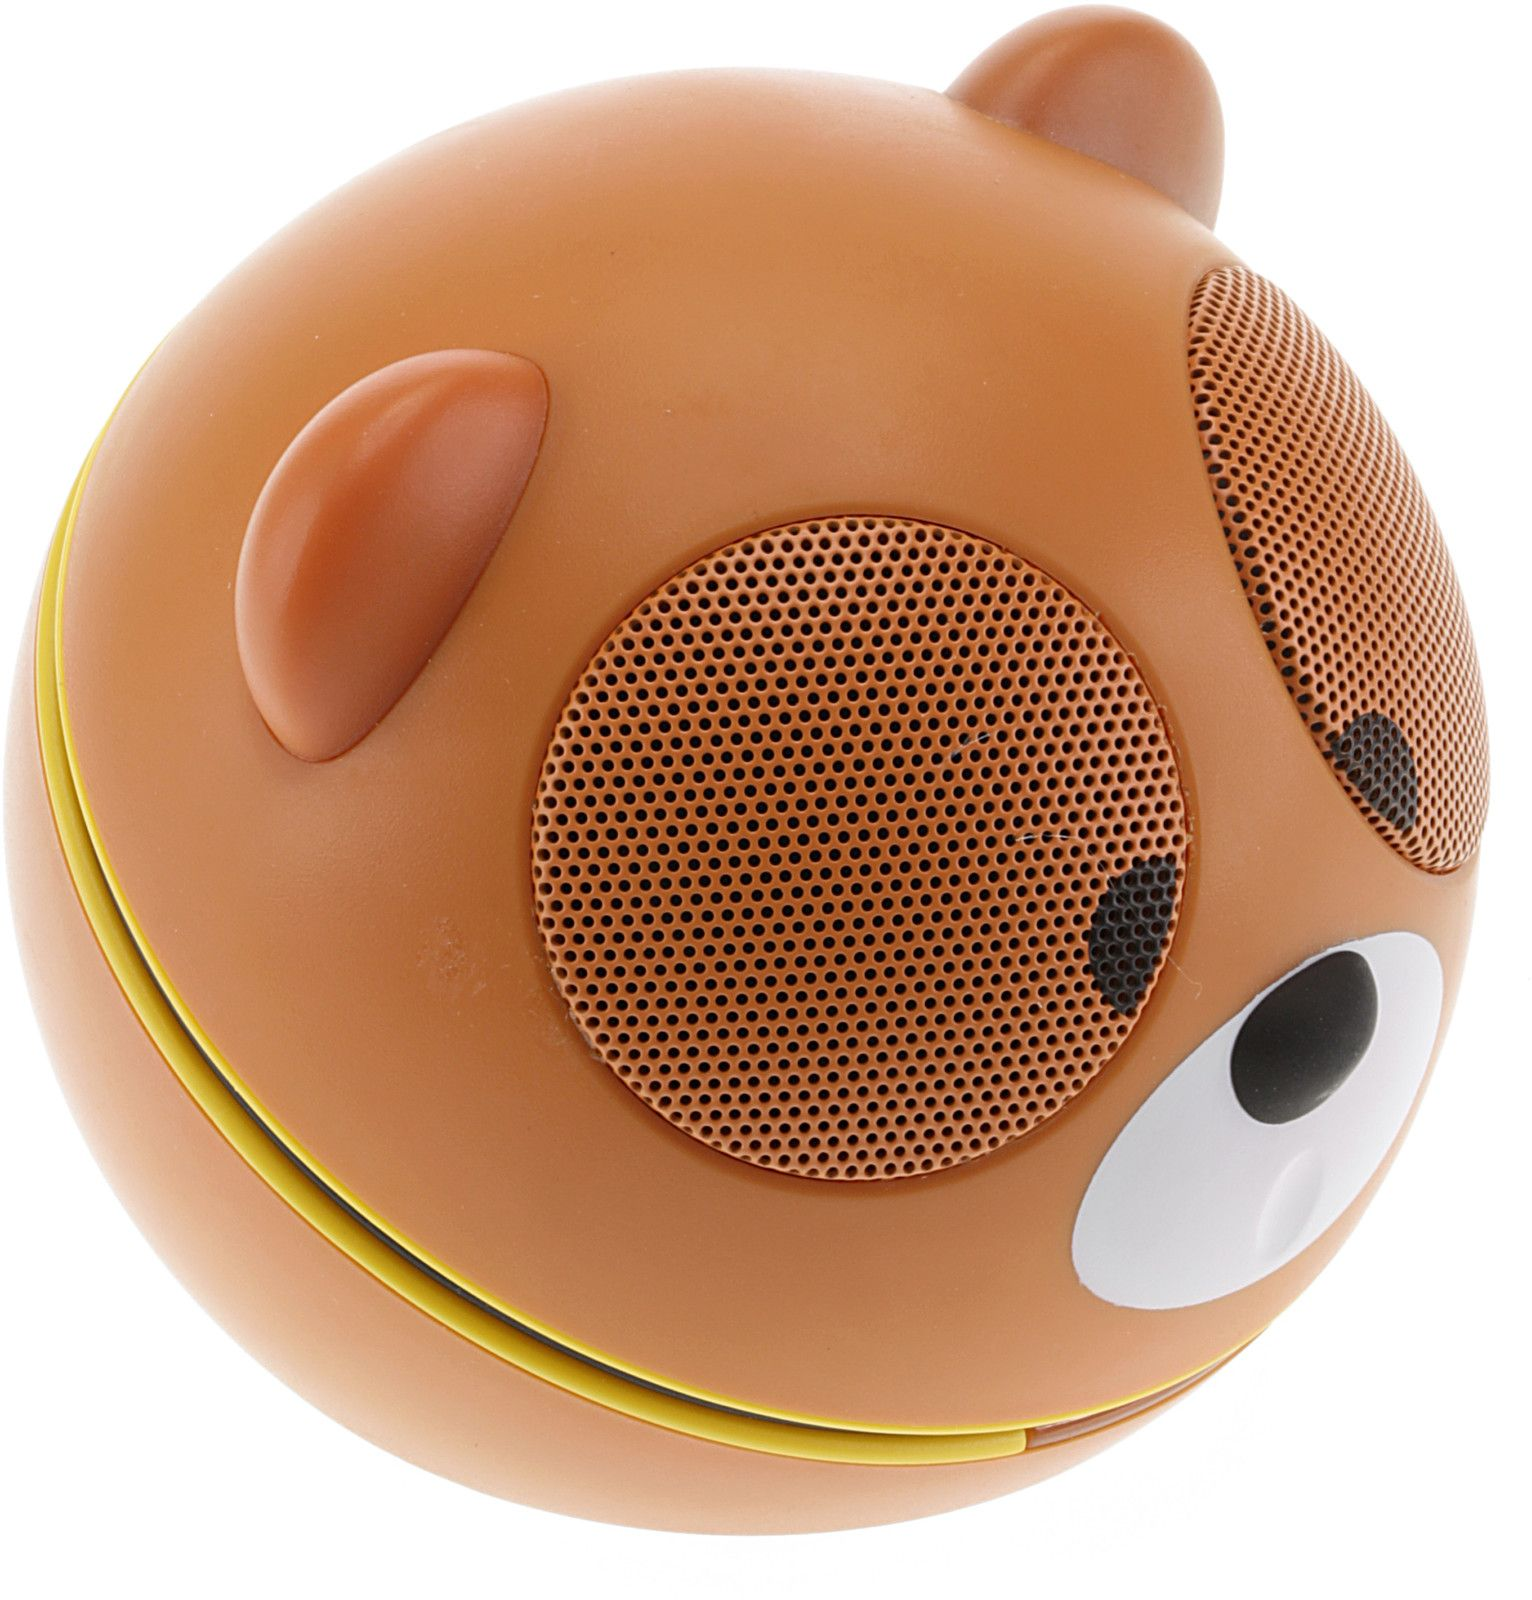 Kitsound Bear XL - Portabel högtalare